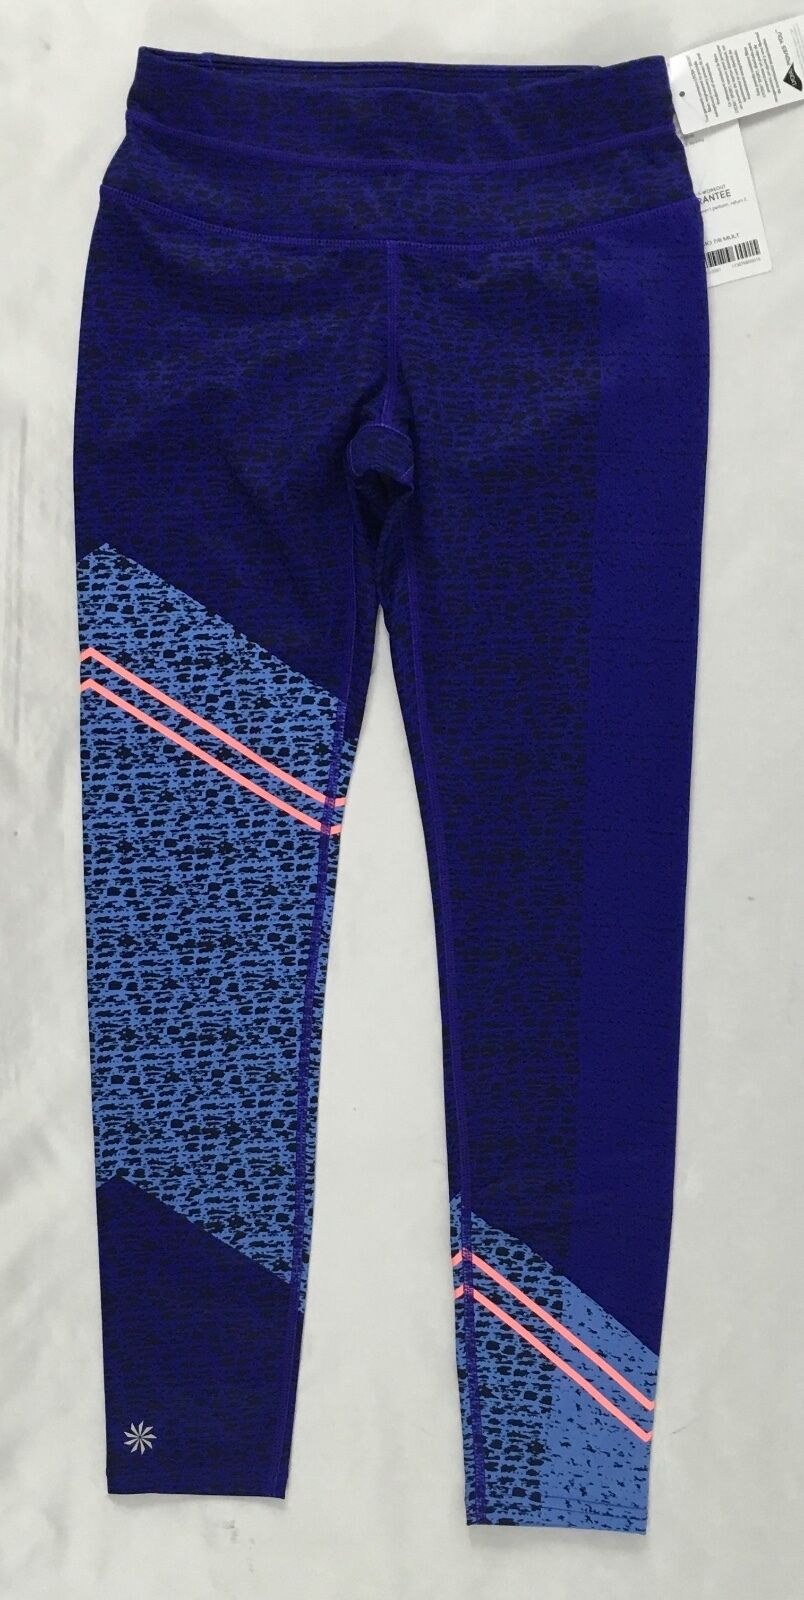 Athleta Women's Mid Rise Asym Camo Sonar 7 8 Tight Purple  98 Size XS